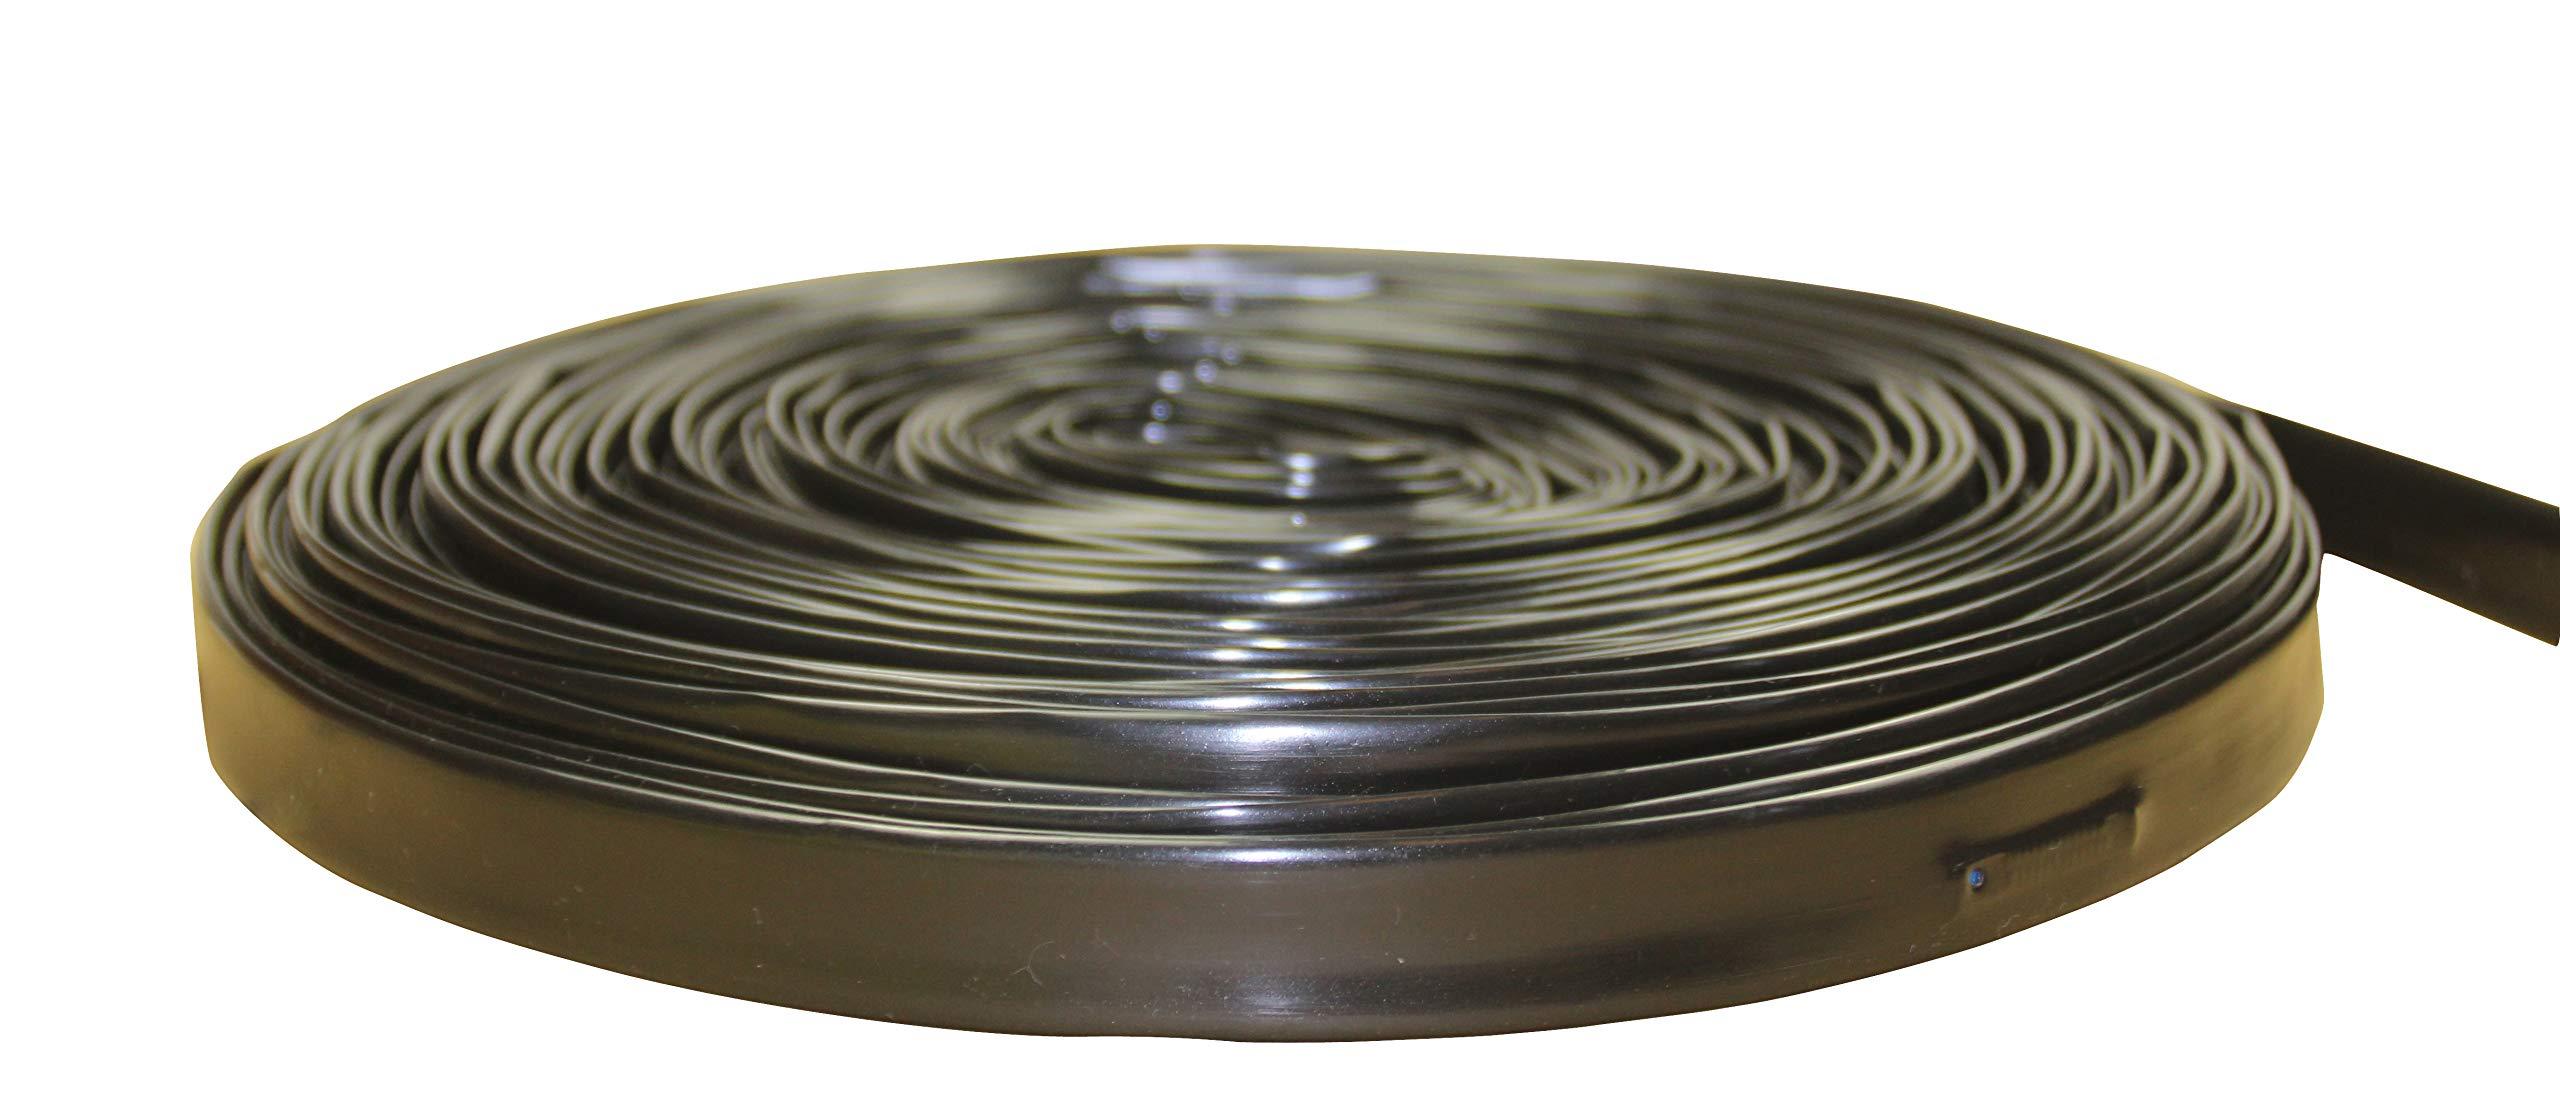 PLMN Drip Irrigation Tape 12 mil/0.3mm, Length 150', 12'' Spacing, 0.79GPH